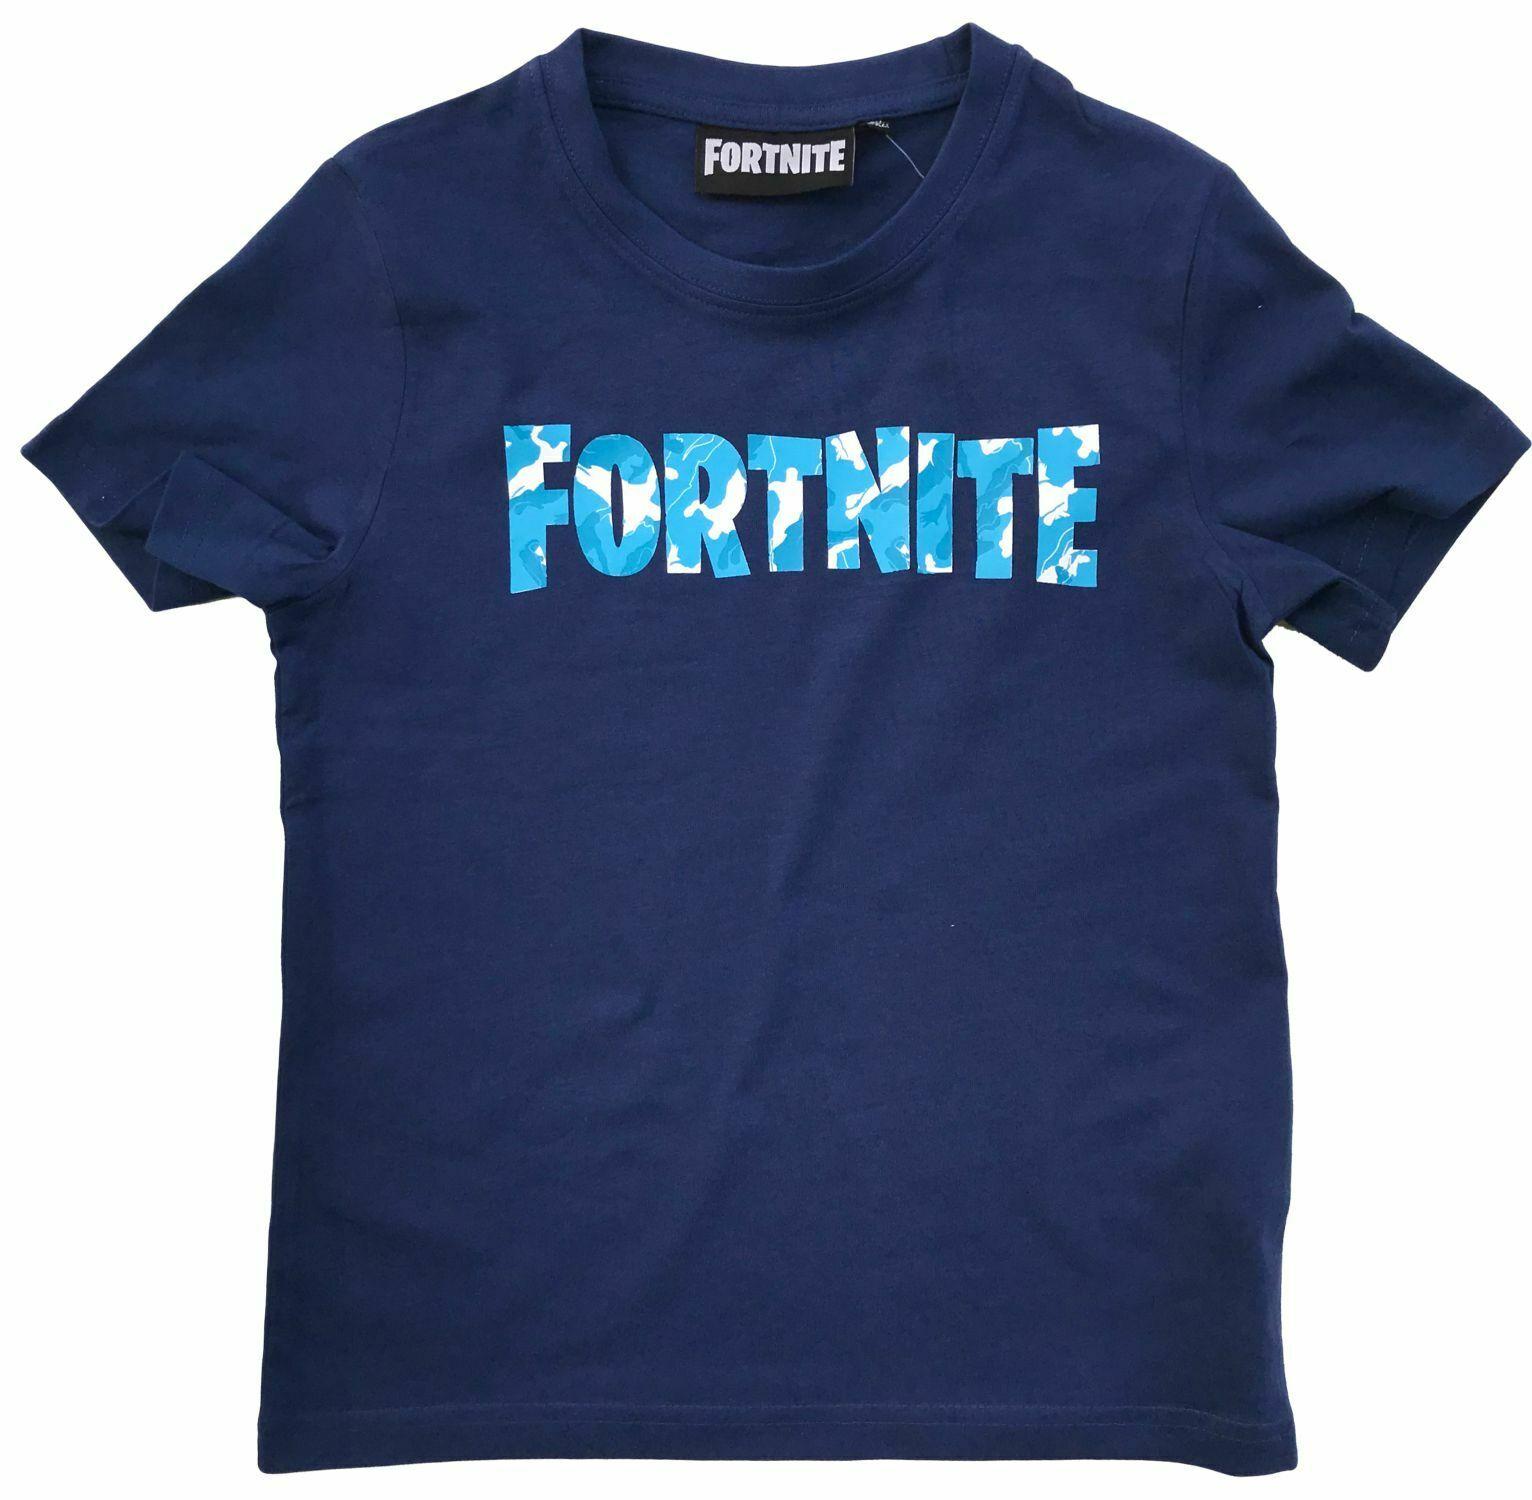 Fortnite T-Shirt Logo dunkel blau Größe 152